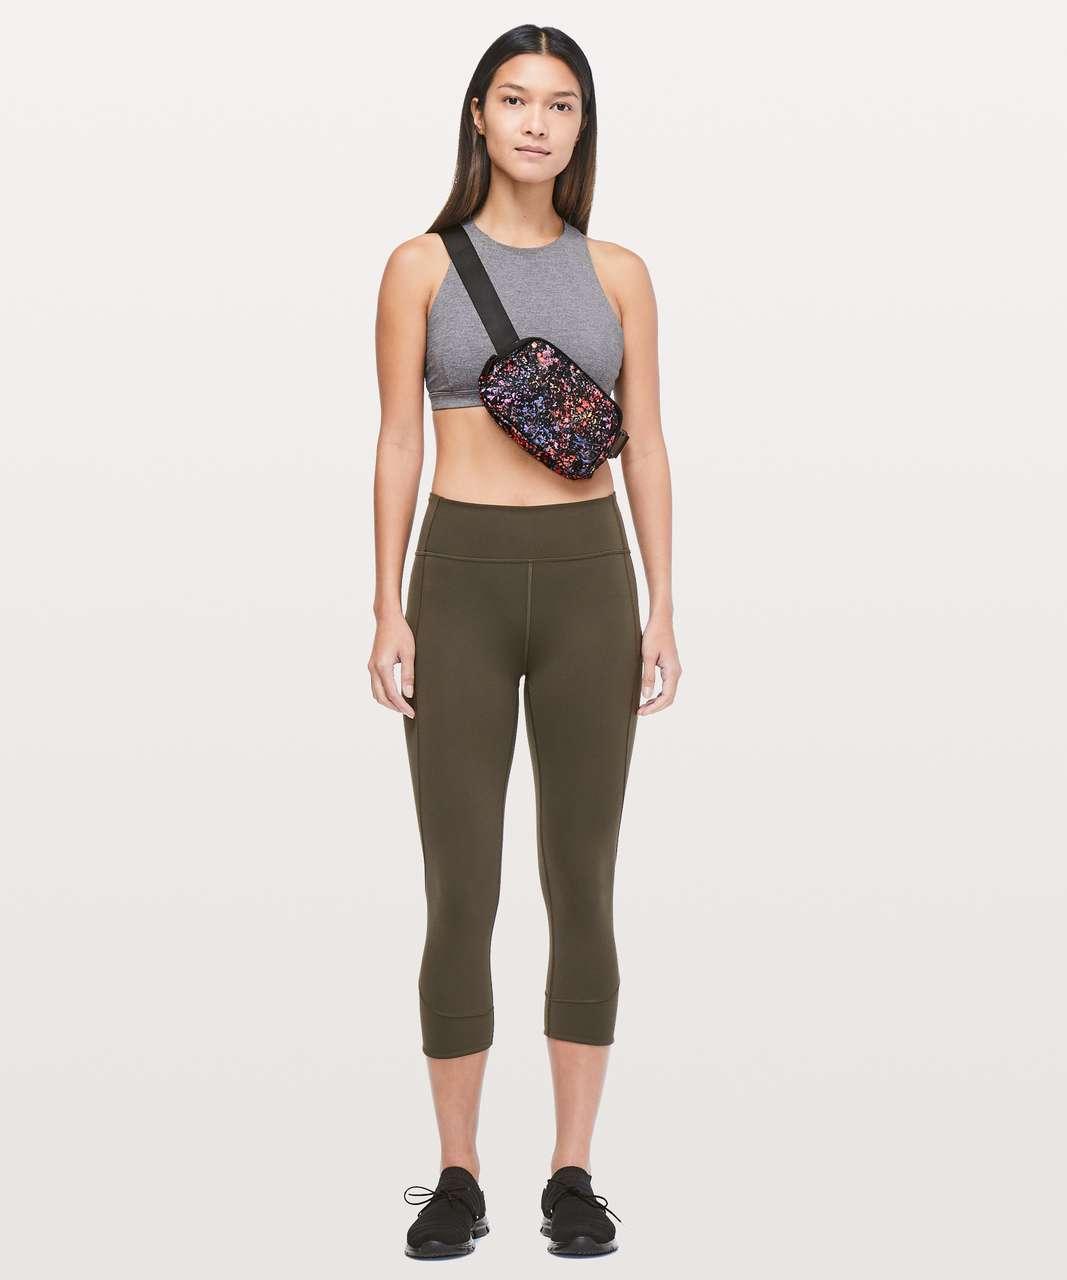 Lululemon Everywhere Belt Bag *1L - Flowerescent Multi / Black